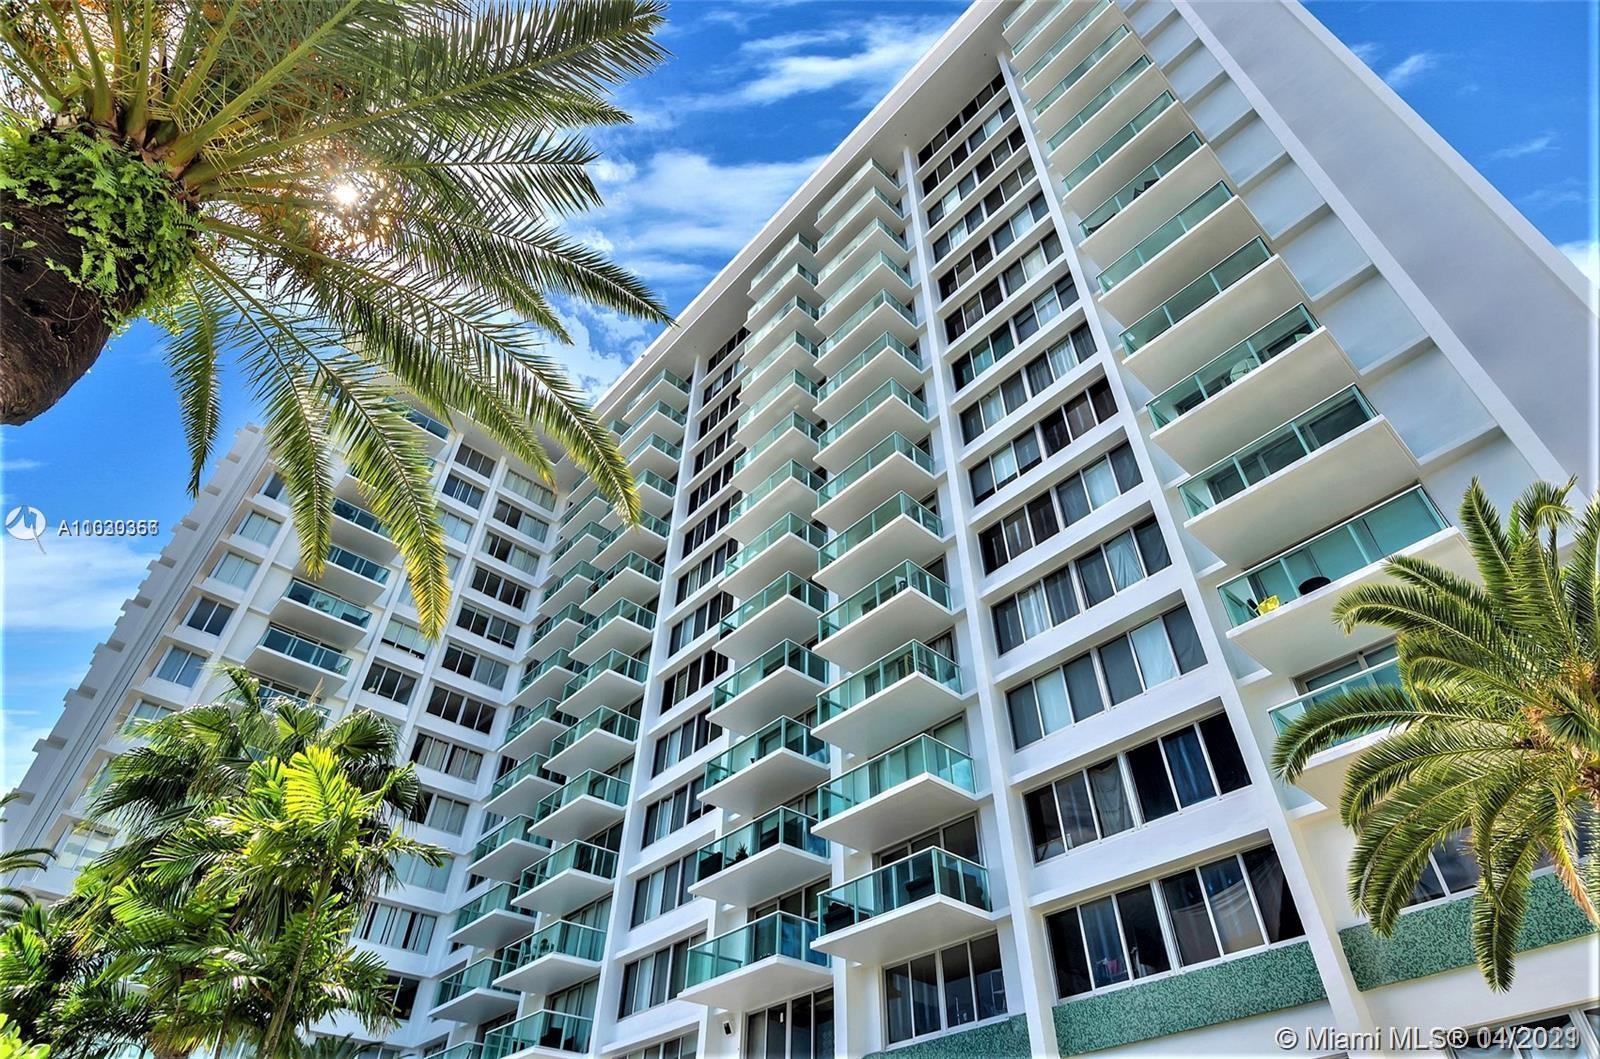 Mirador South #805 - 1000 West Ave #805, Miami Beach, FL 33139